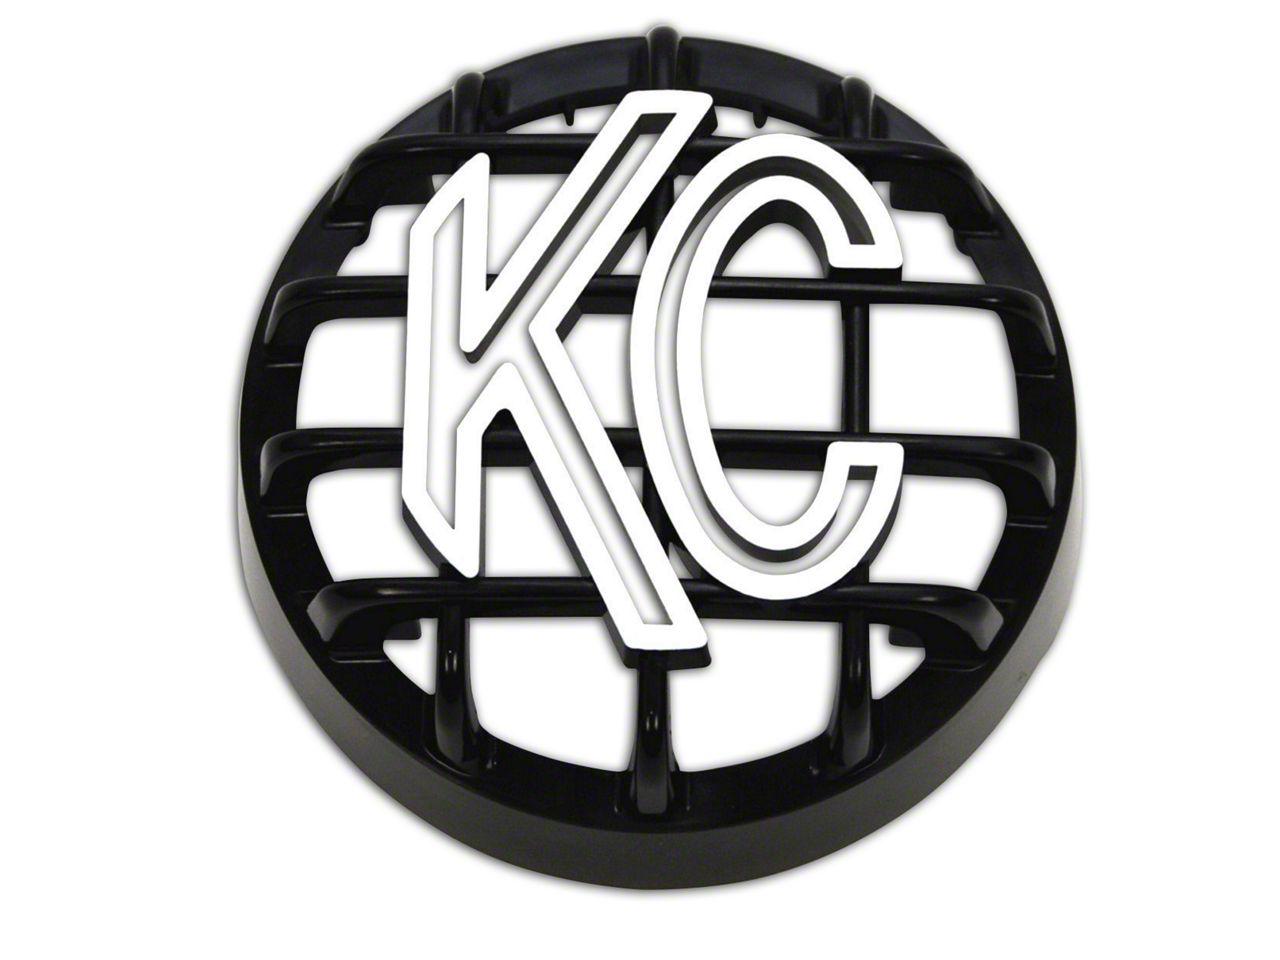 KC HiLiTES 4 in. Round Stone Guard for Rally 400 - Black w/ White KC Logo (87-19 Jeep Wrangler YJ, TJ, JK & JL)